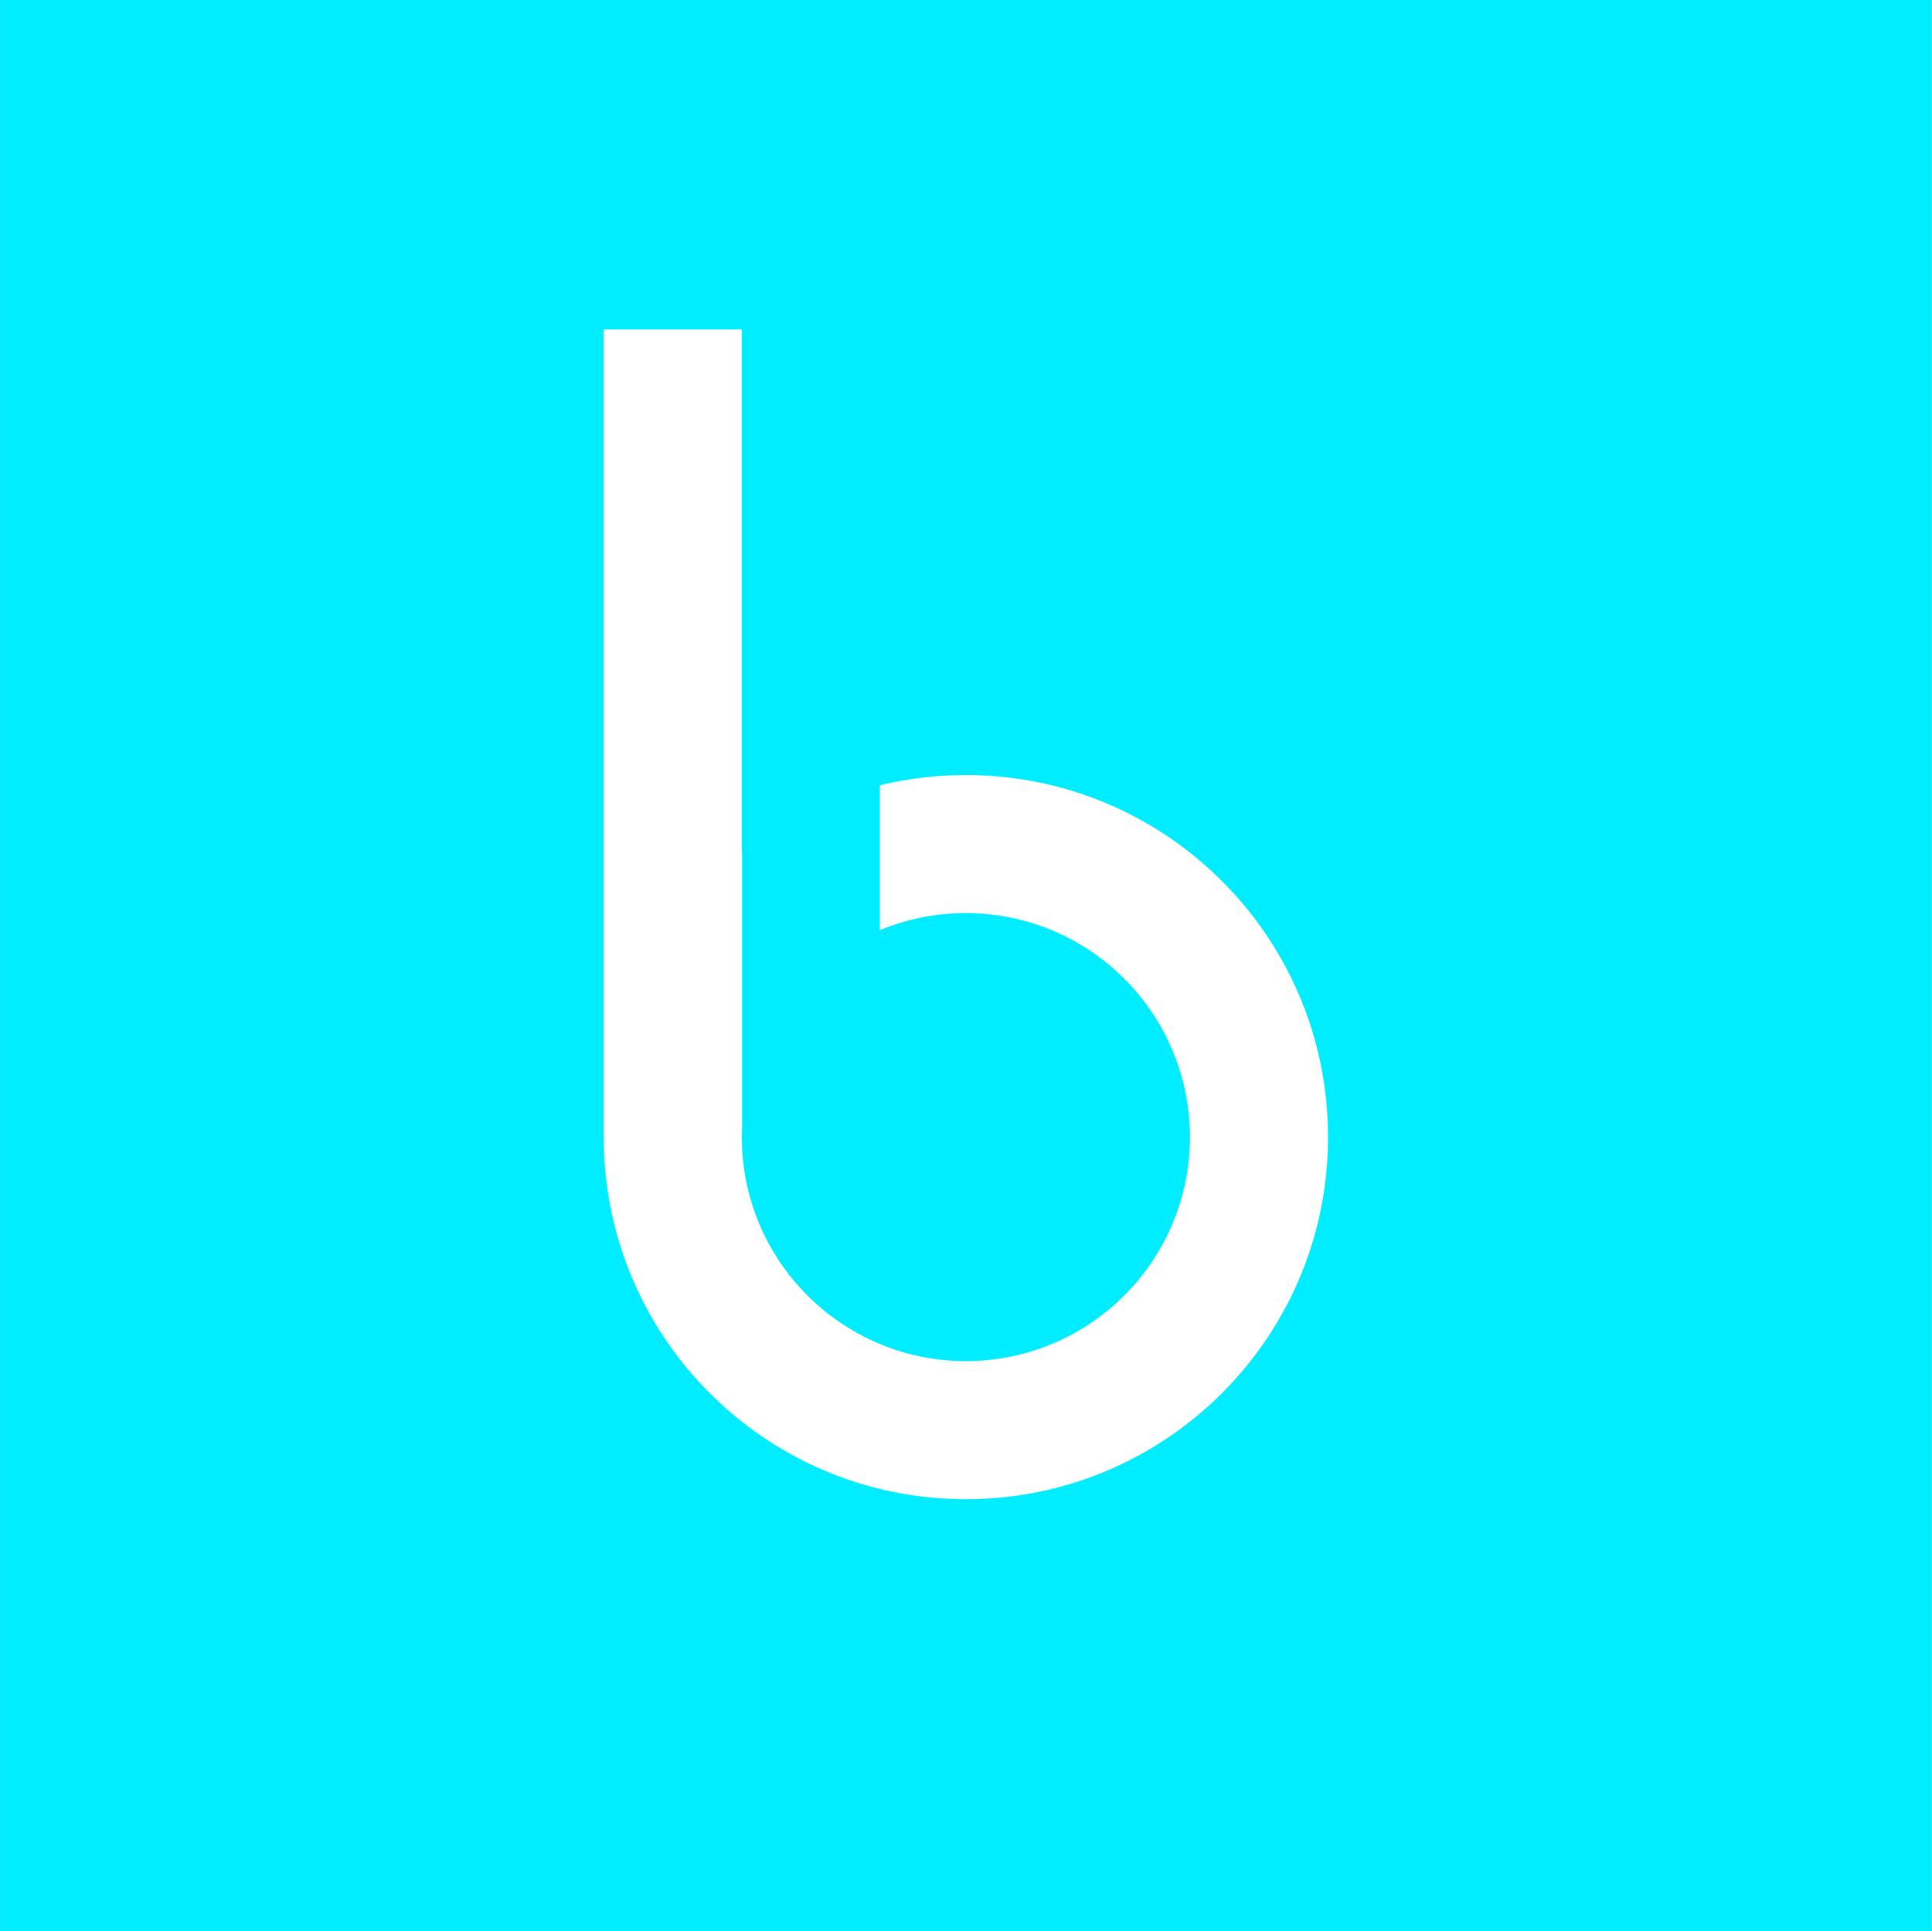 Bilieto - Brand IdentityDigital Design